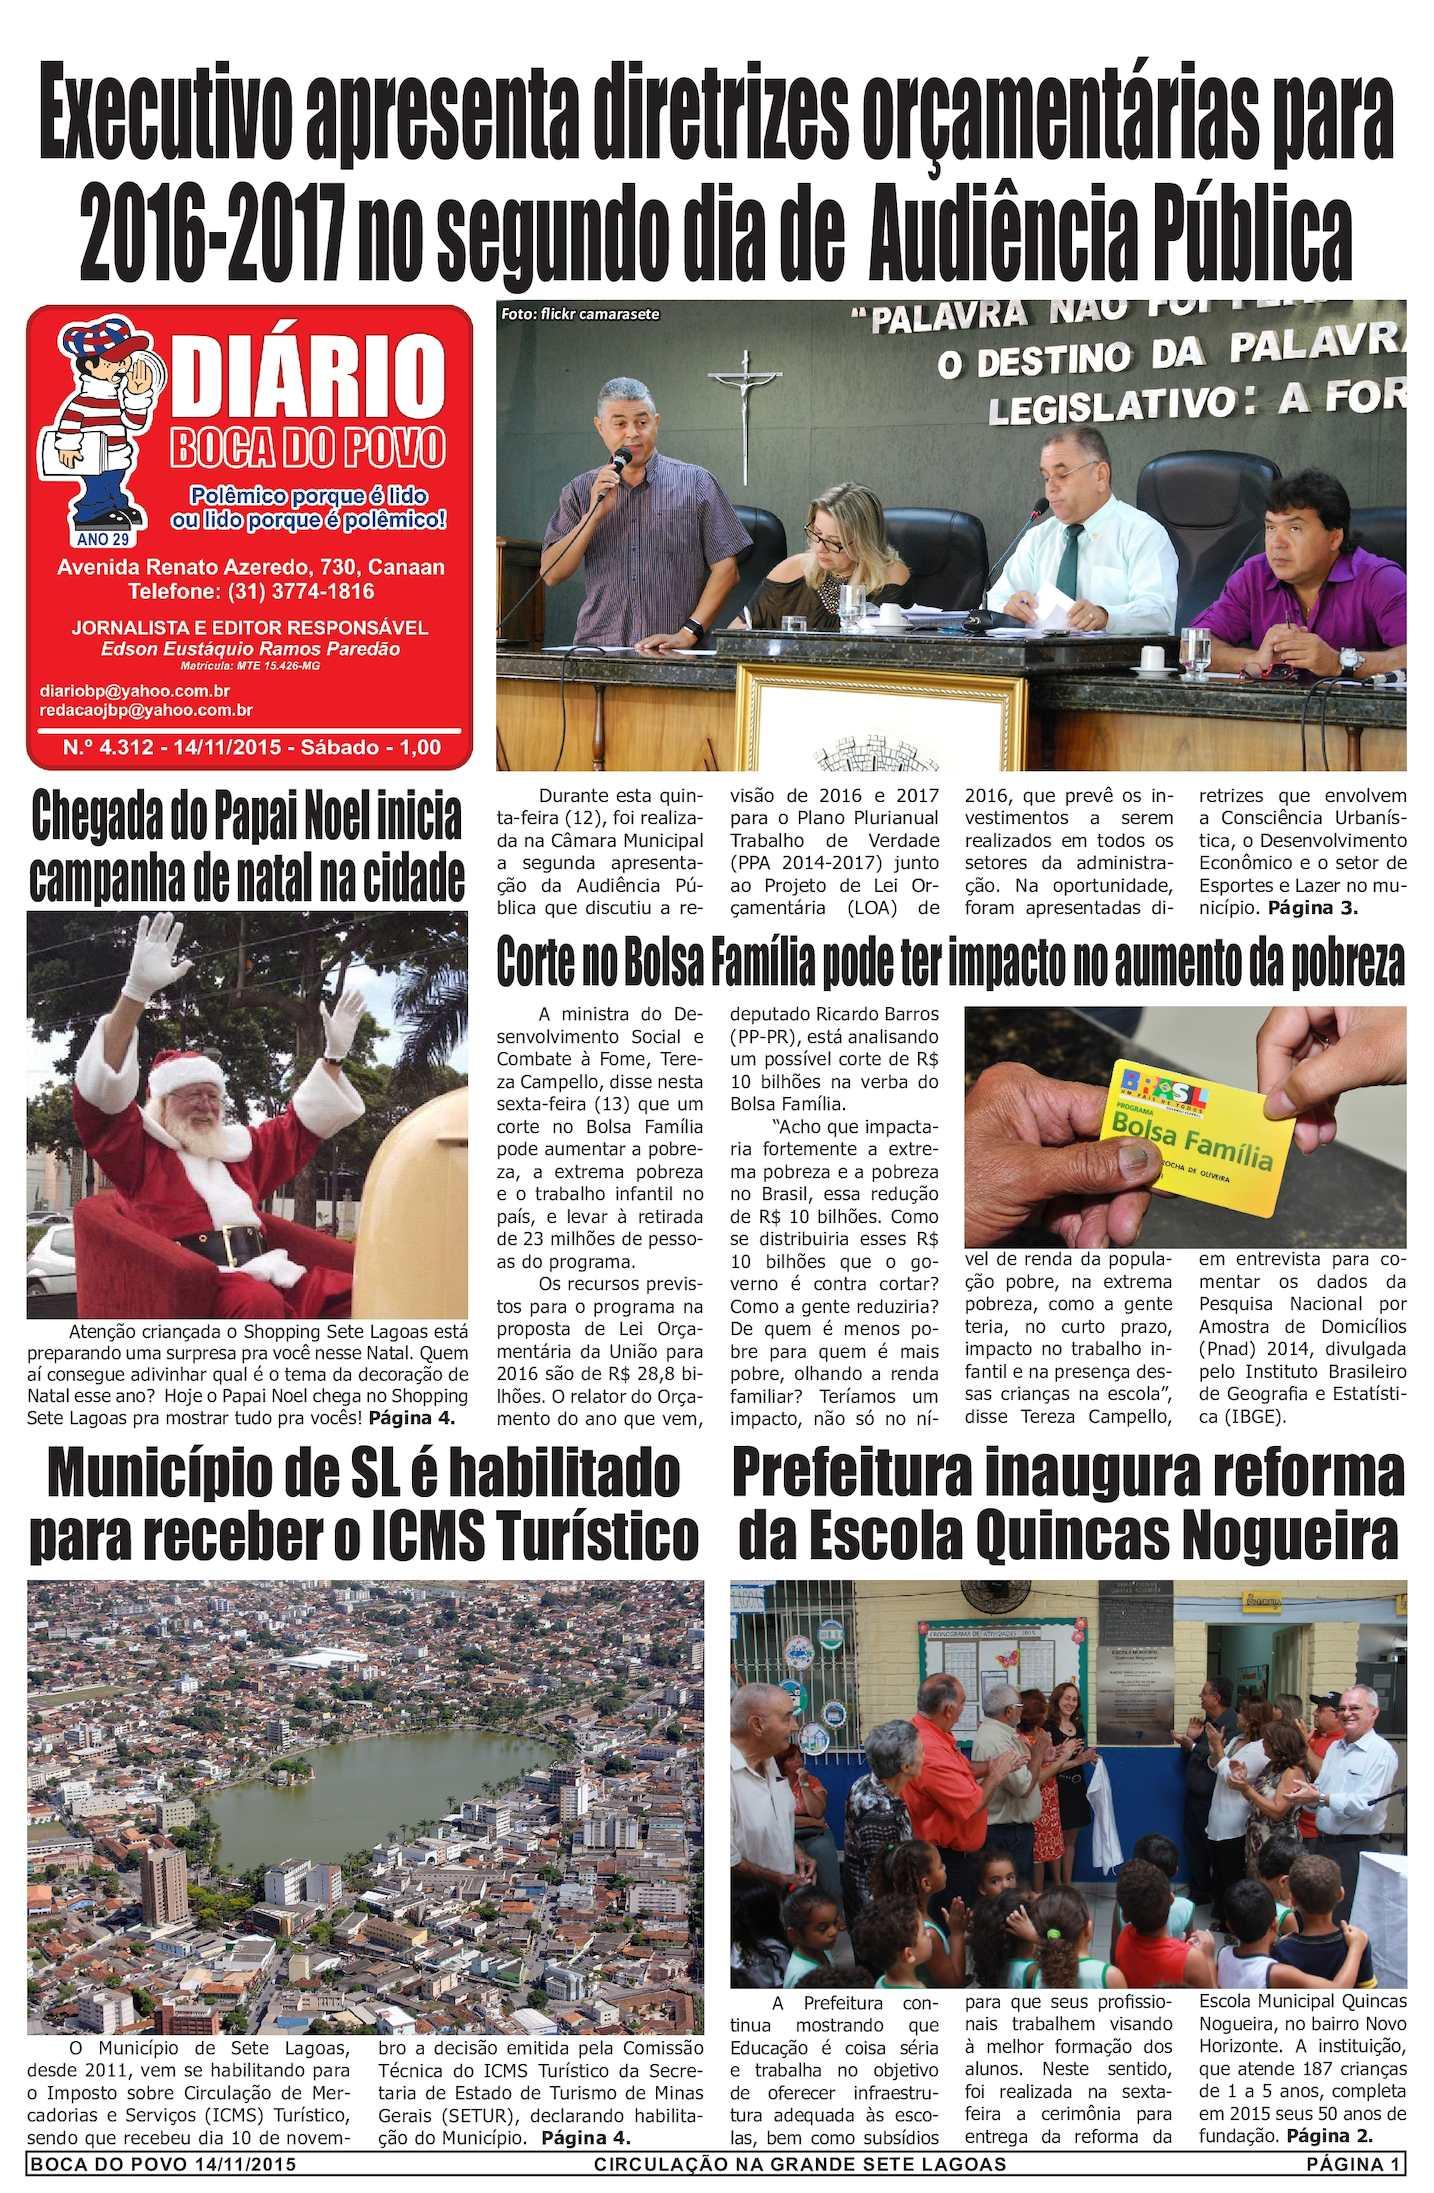 Calam O Jornal Di Rio Boca Do Povo De S Bado Dia 14 De Novembro De